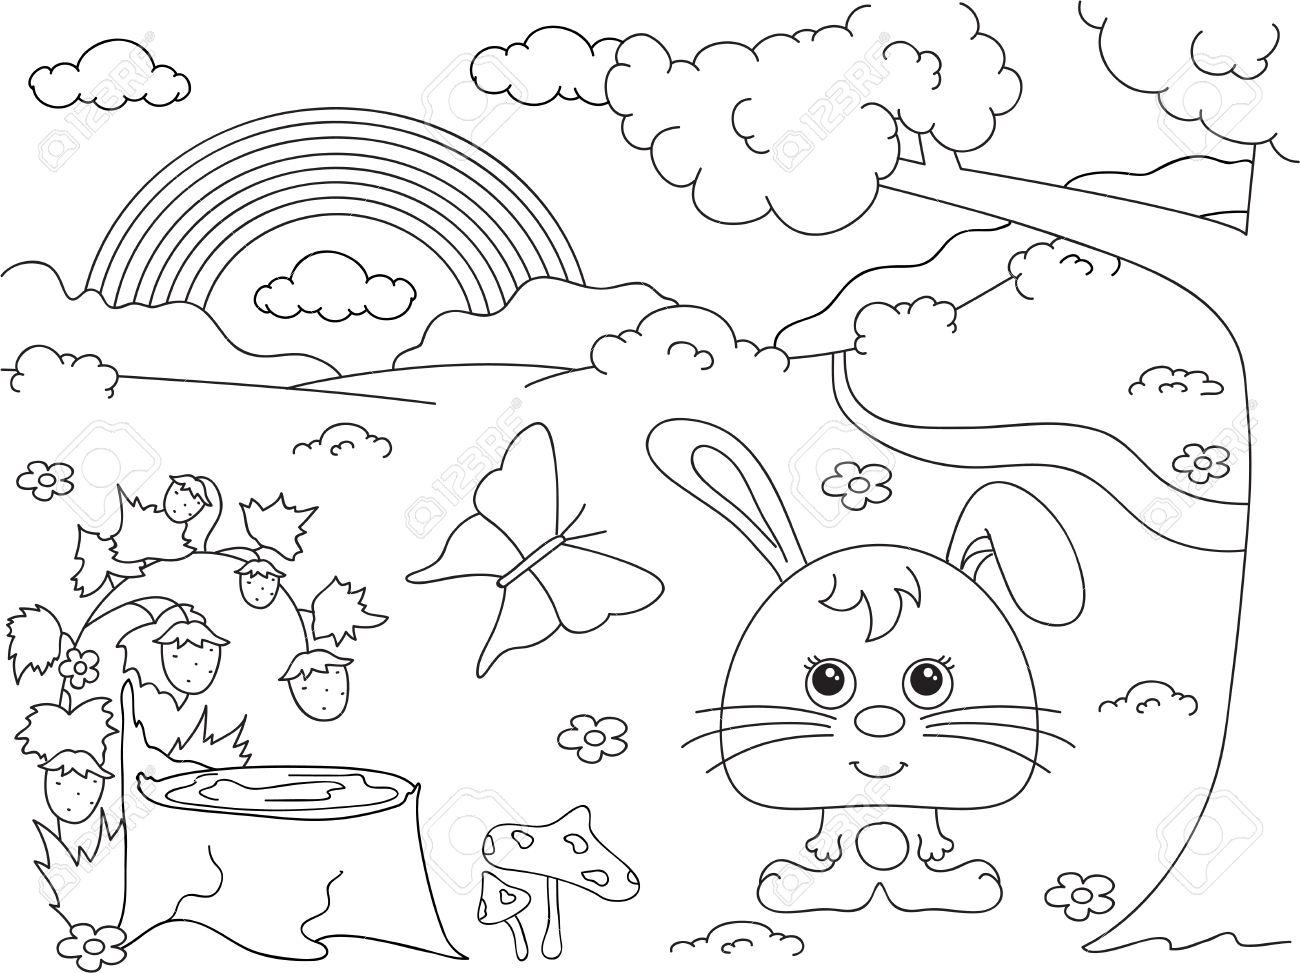 Stub coloring #15, Download drawings